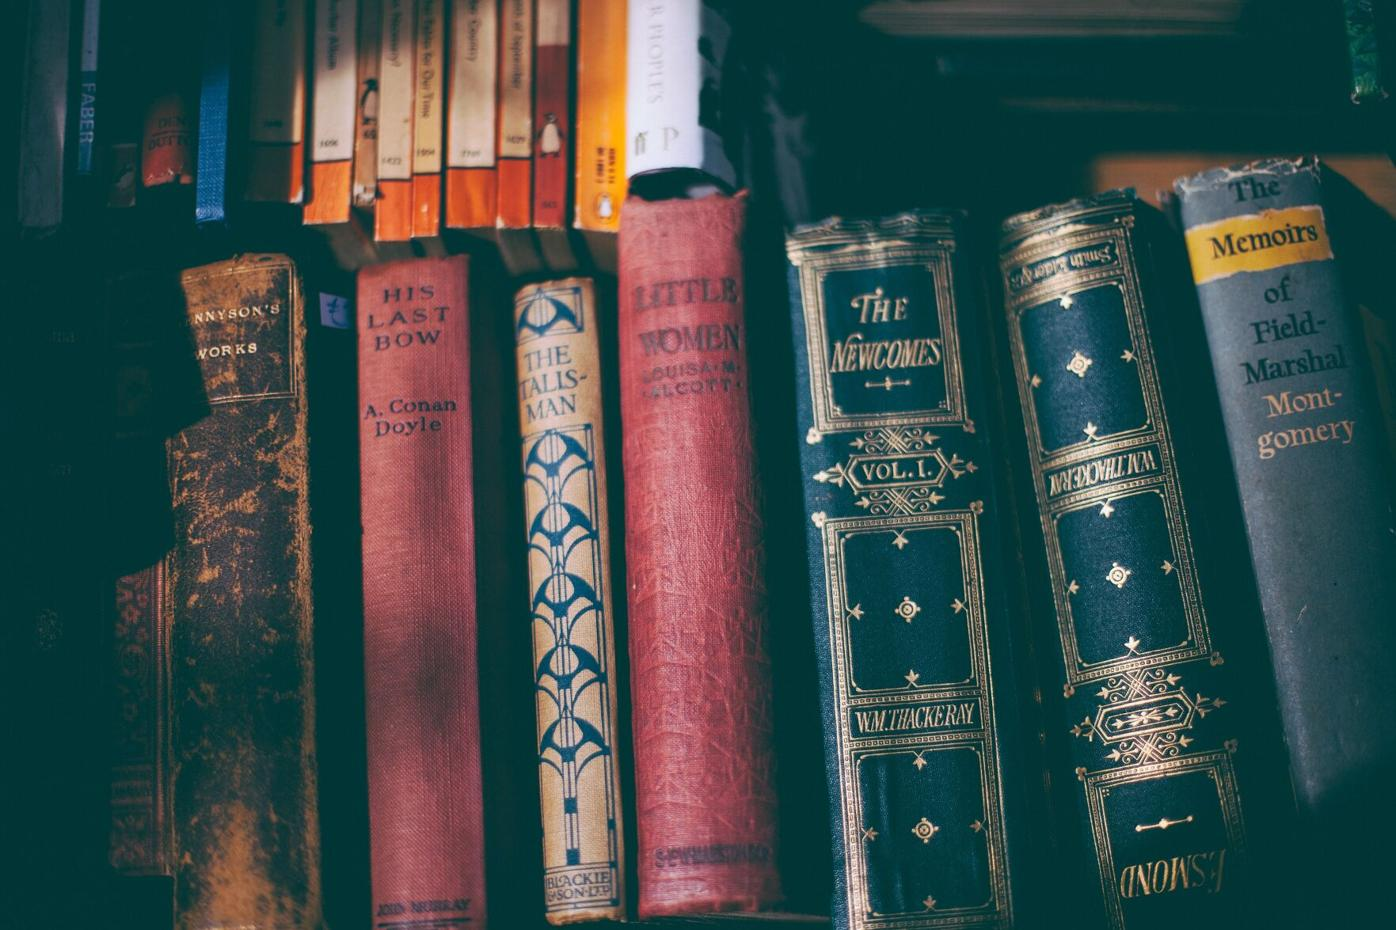 Old_books_on_bookshelf..jpg